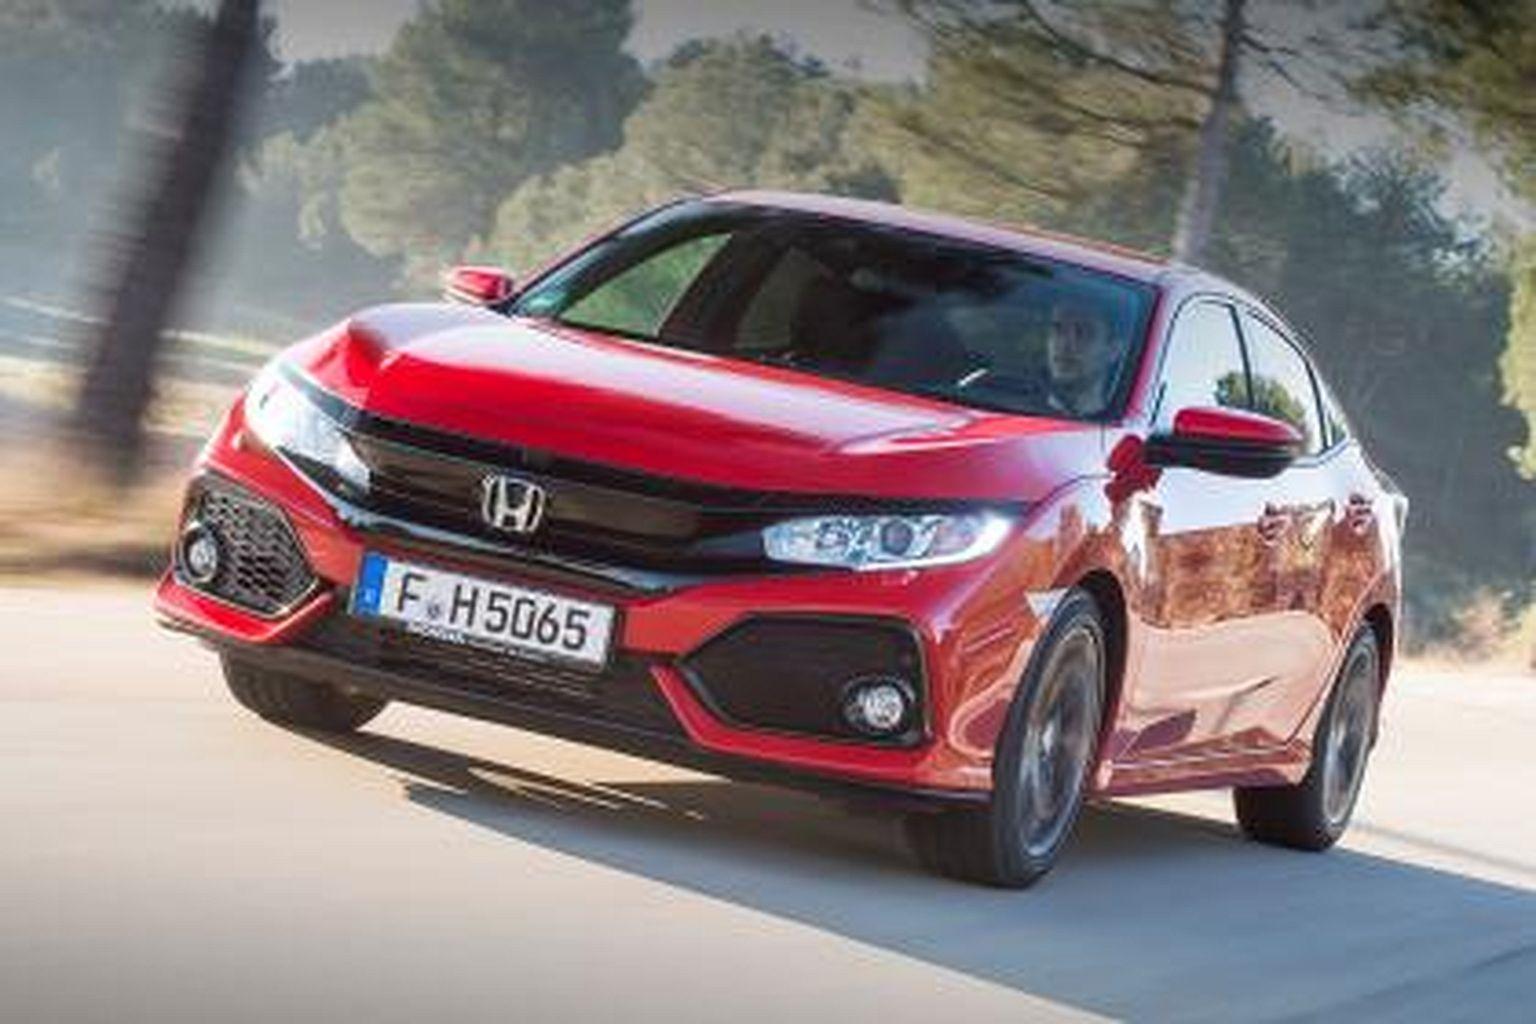 Display Cars Honda Civic Hatchback 2017